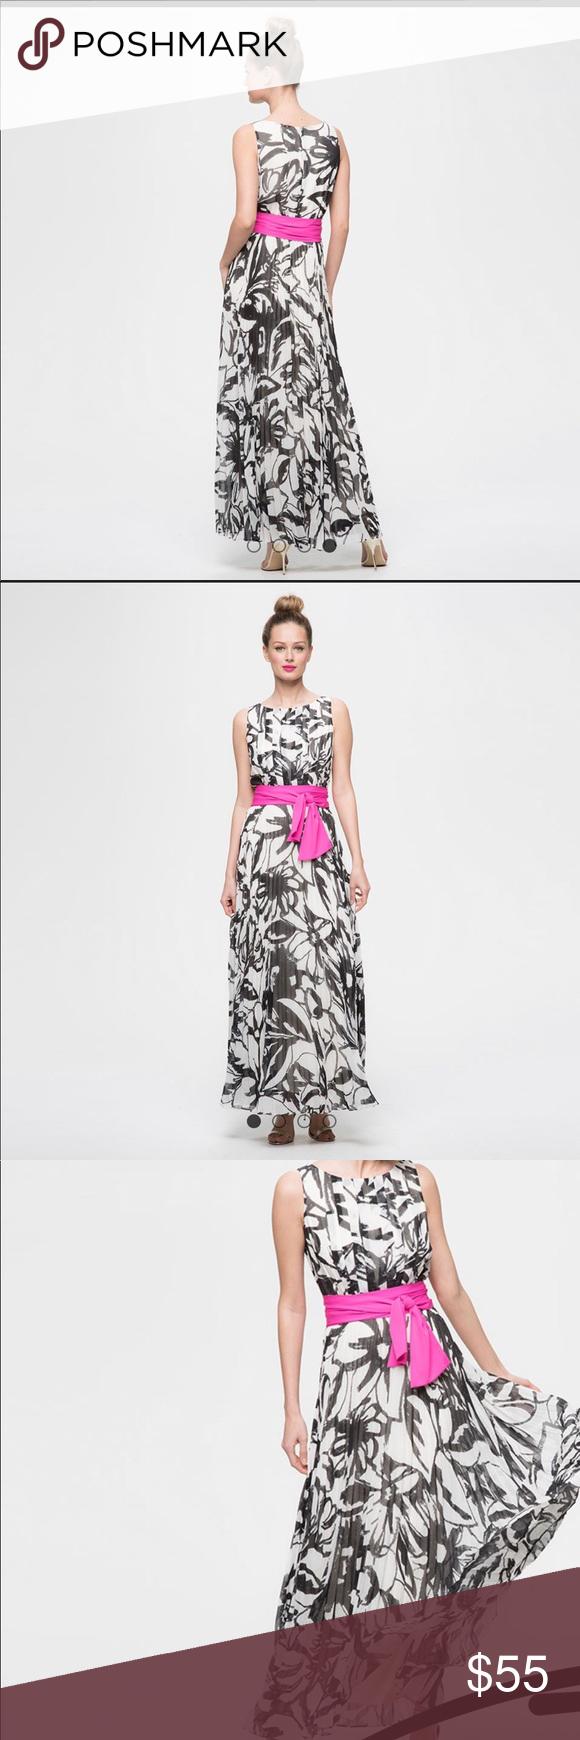 Eliza j long floral dress nwt nwt pinterest long floral dresses